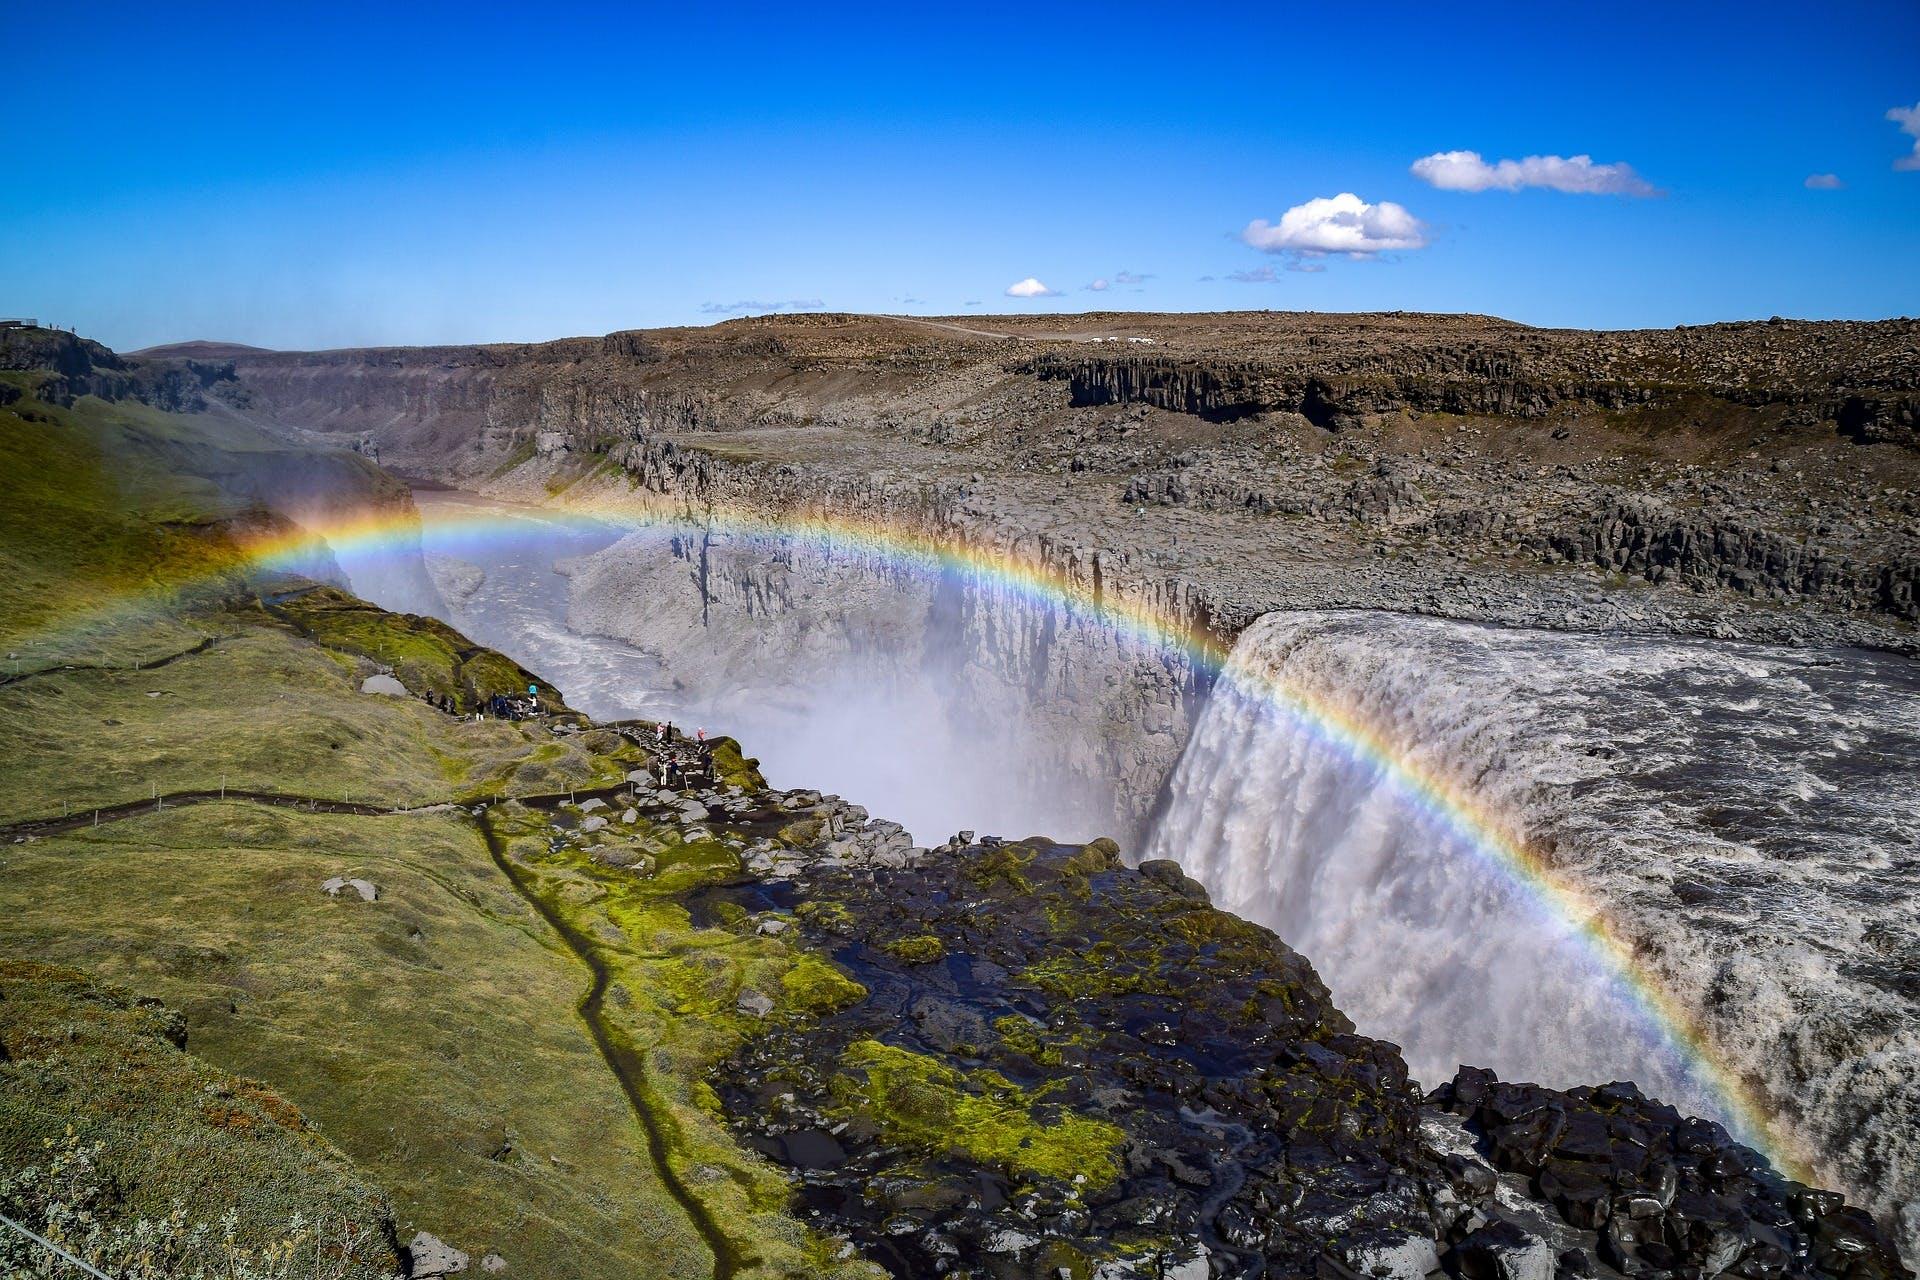 Rainbow over Dettifoss waterfall